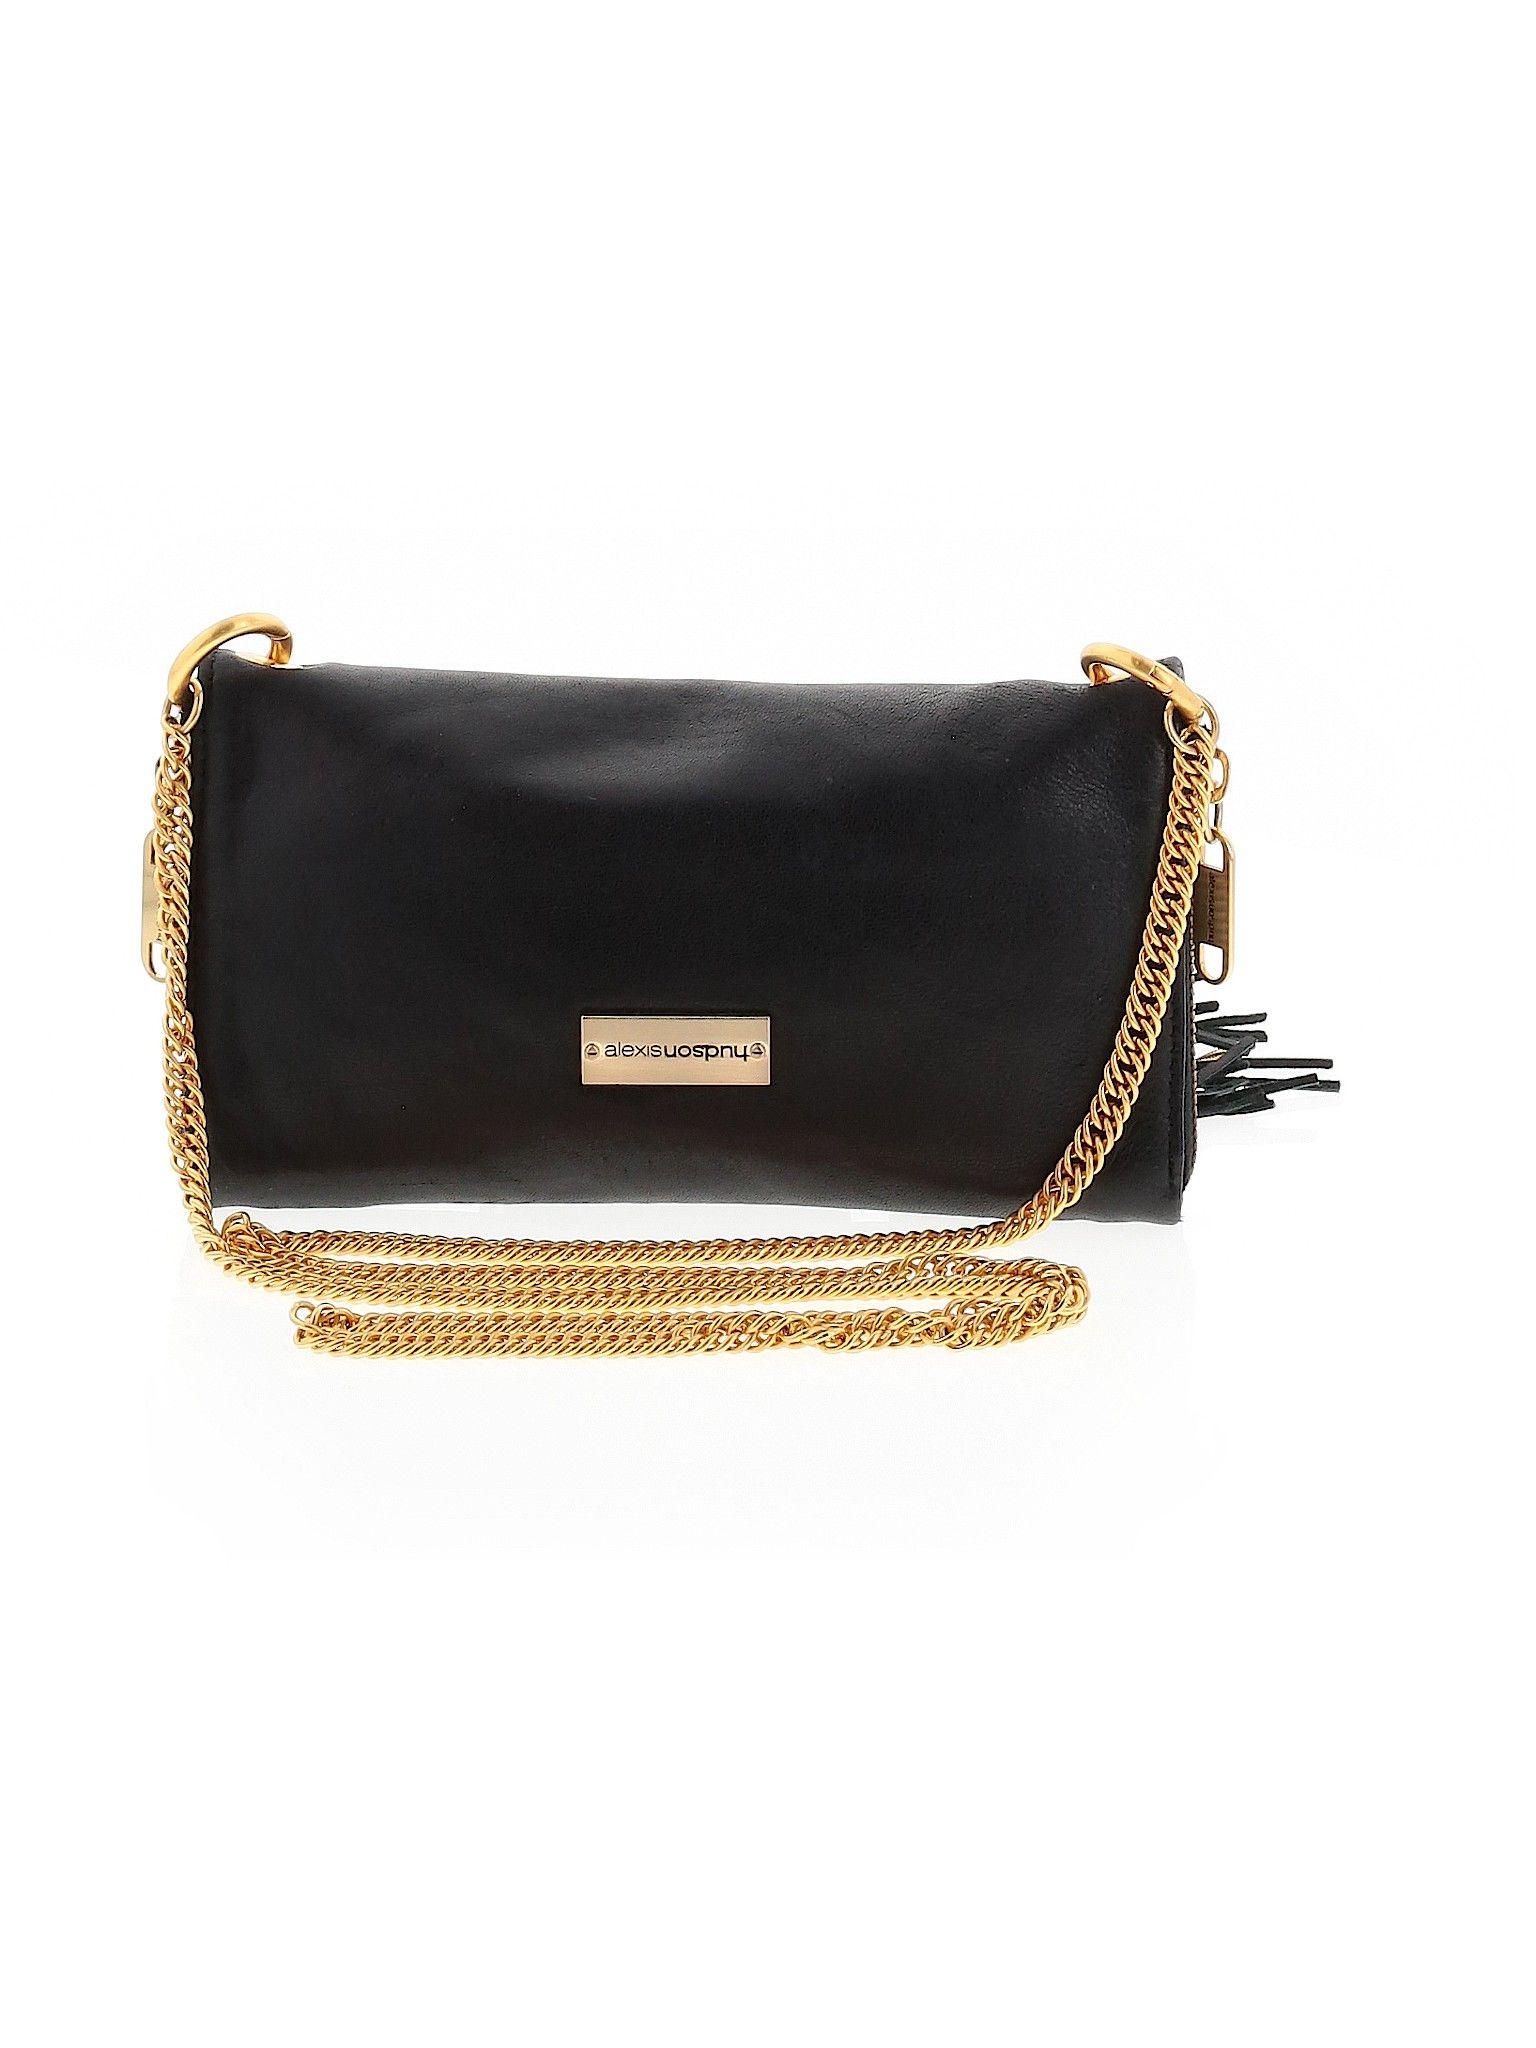 Alexis Hudson Leather Crossbody Bag